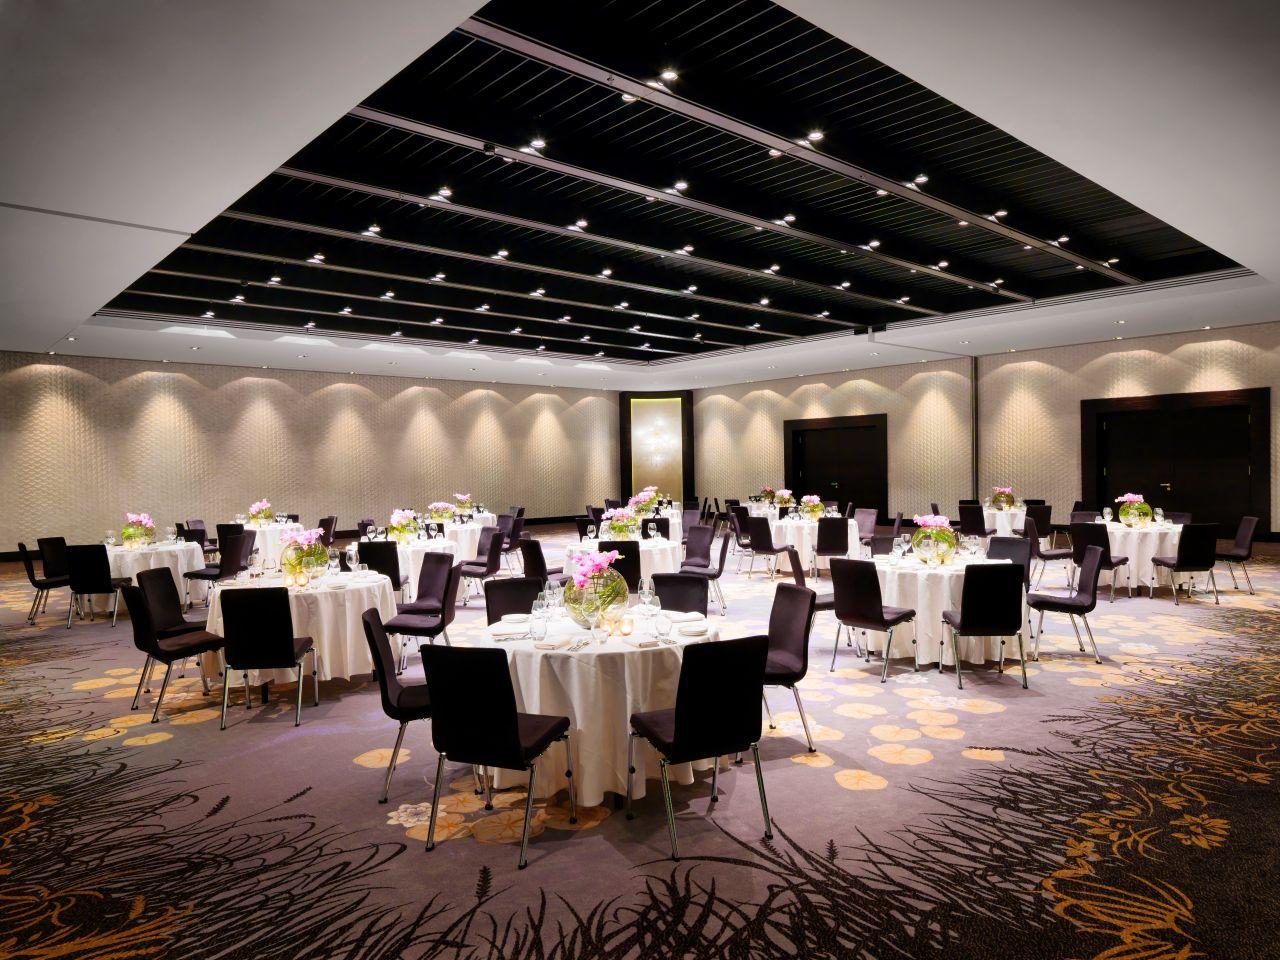 Ballroom banquet space